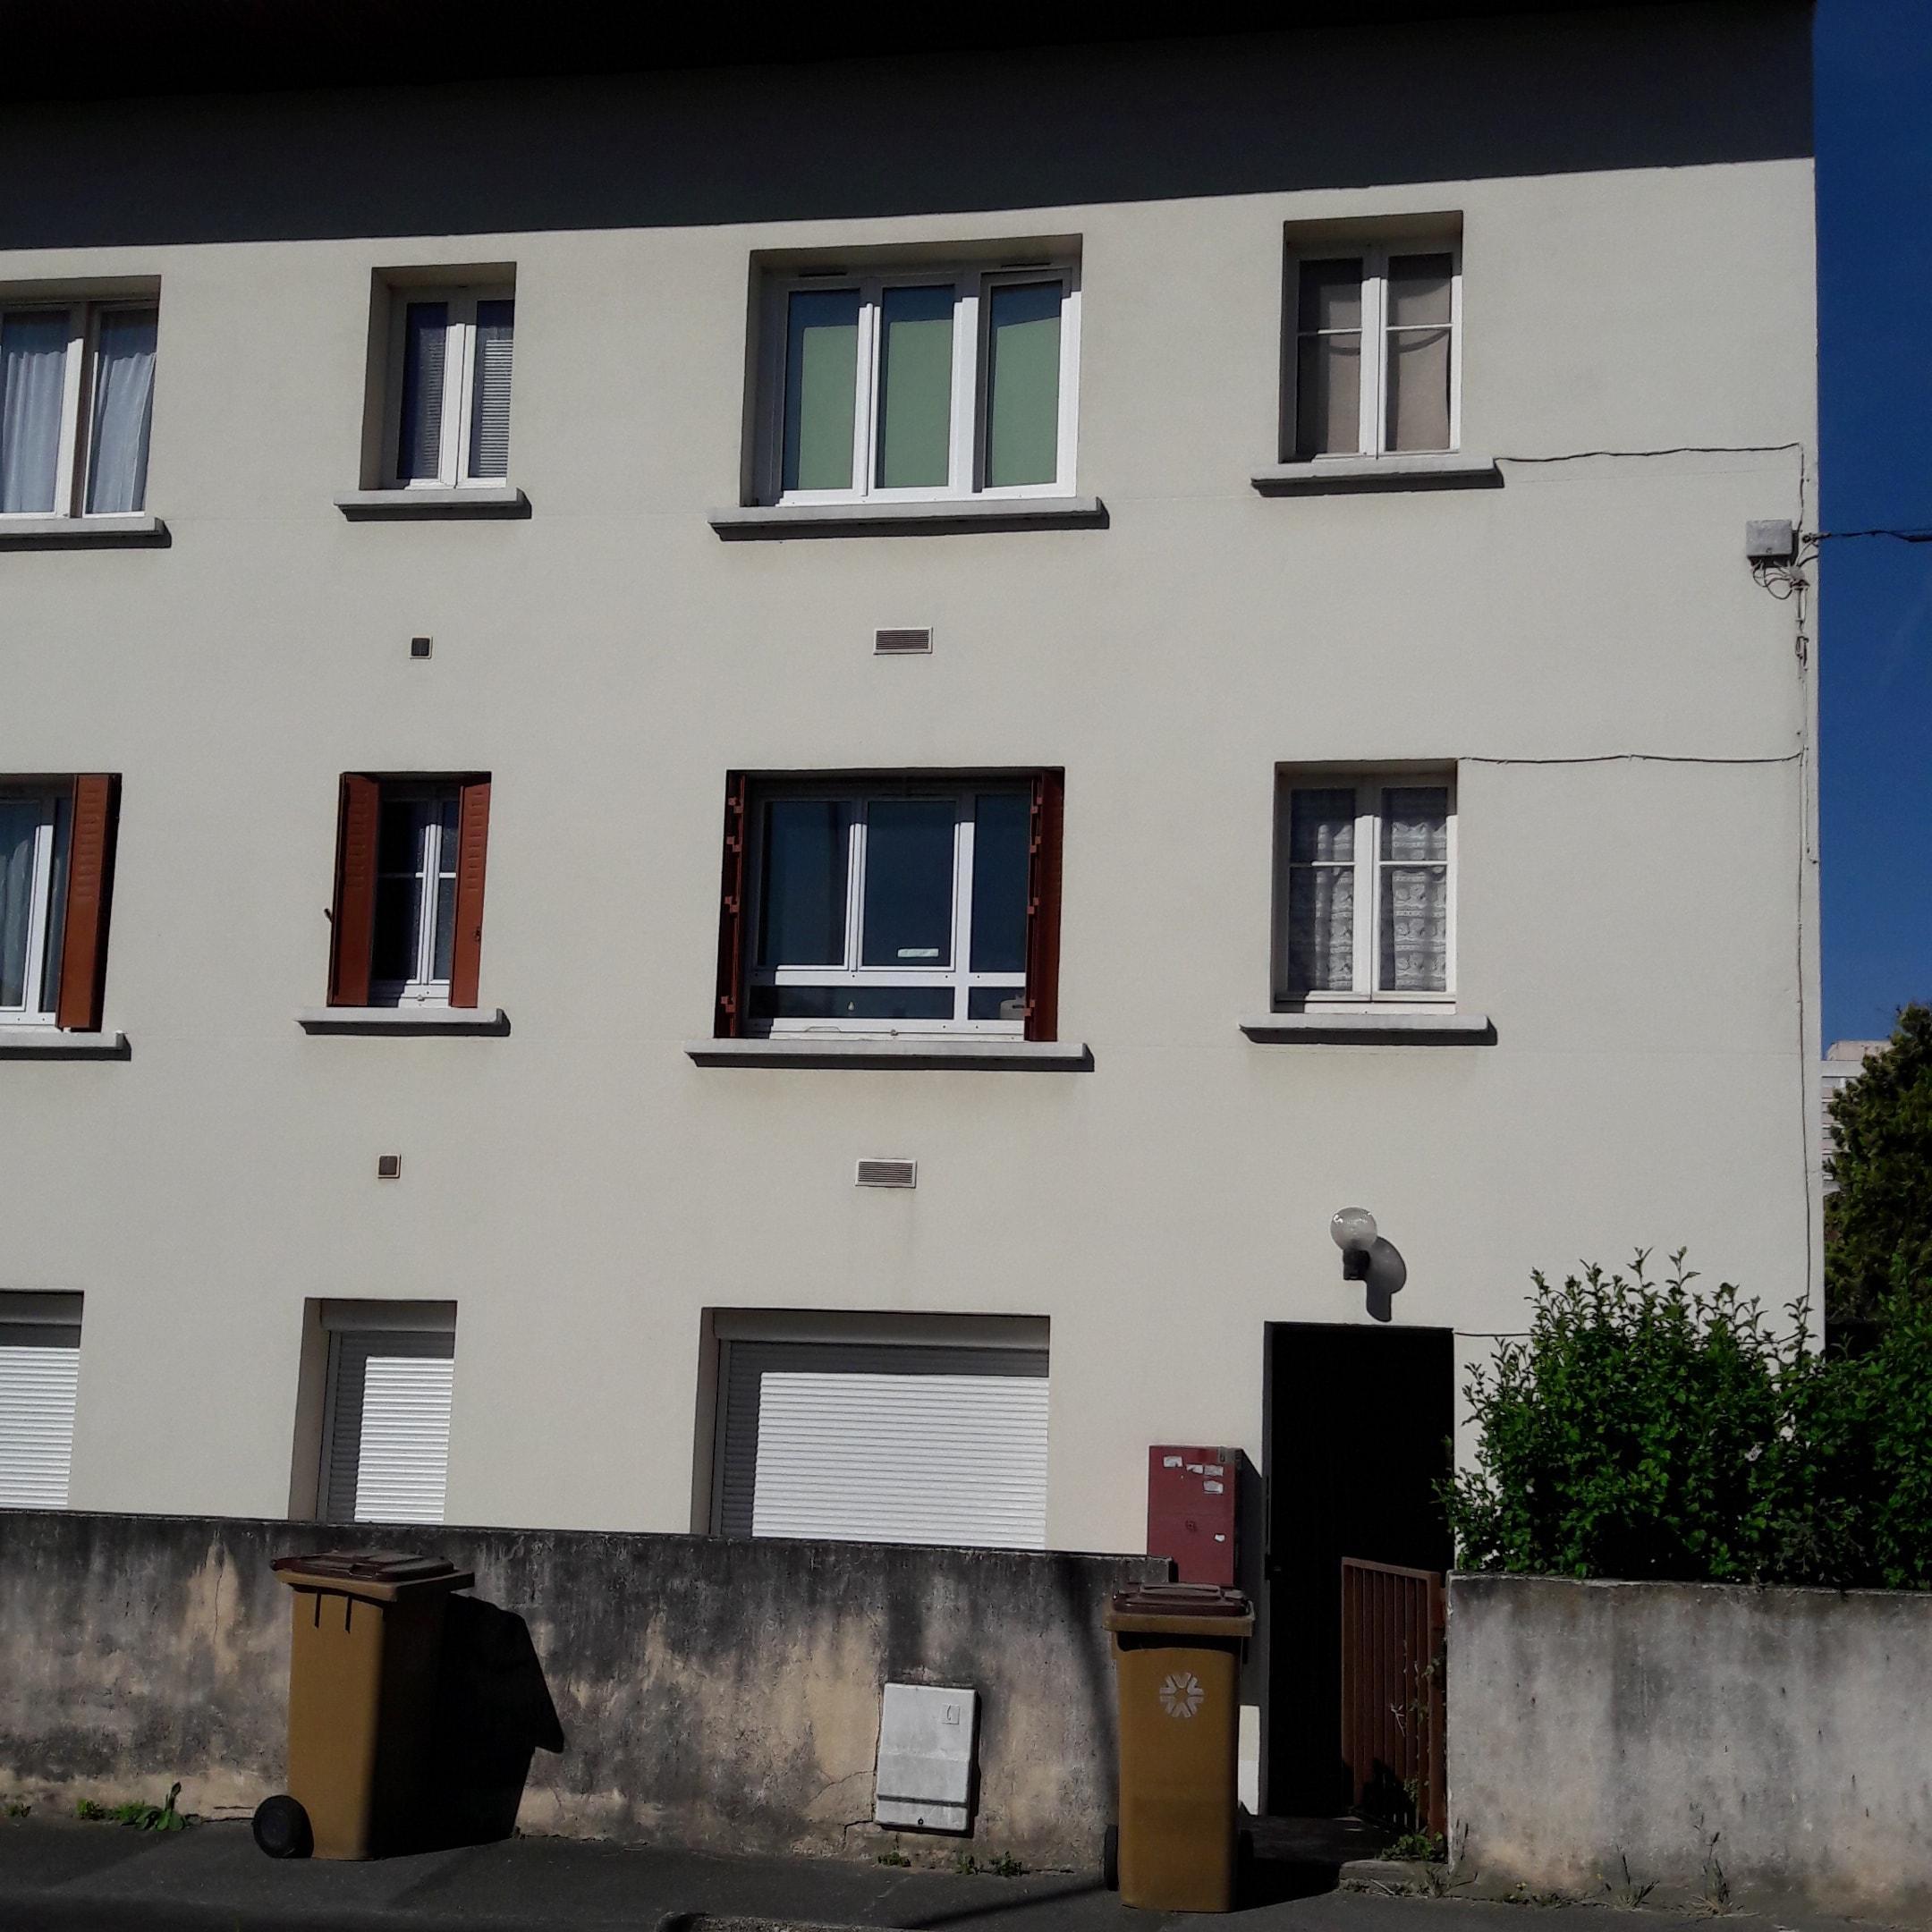 Rue Des Blancs